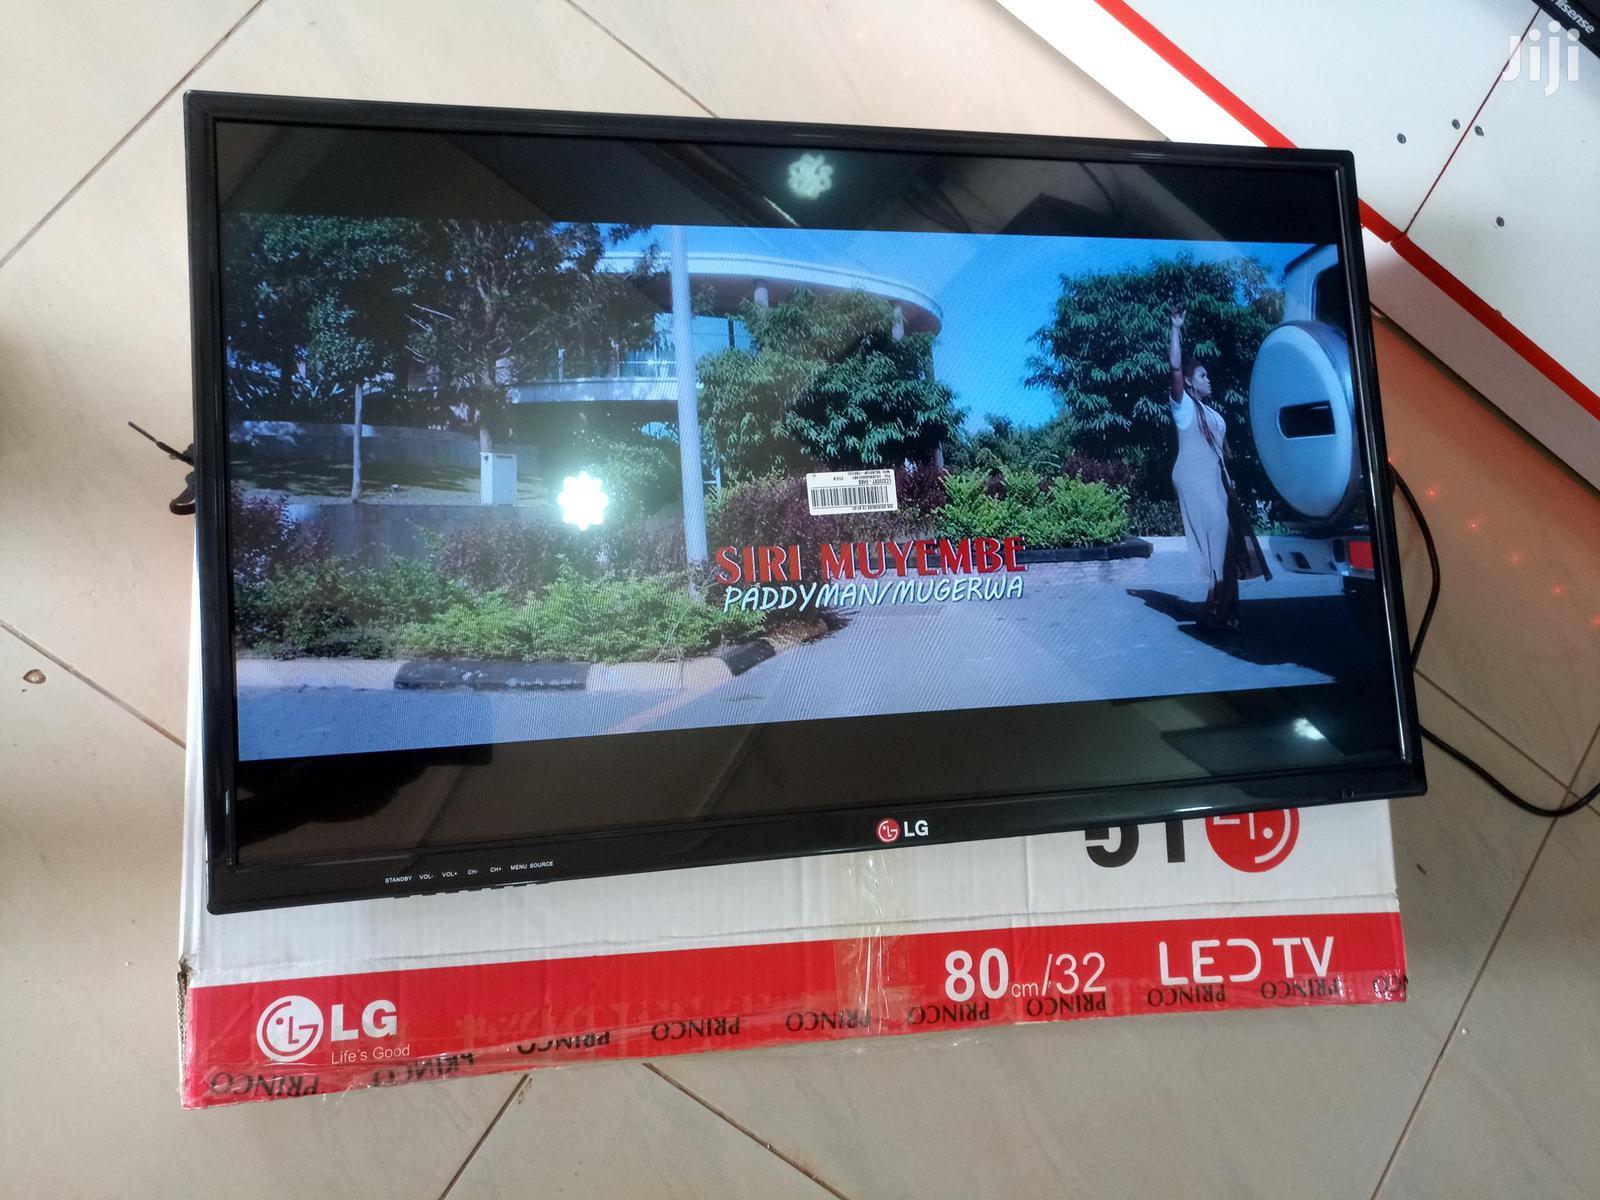 Archive: LG LED Flat Screen Digital TV 32 Inches